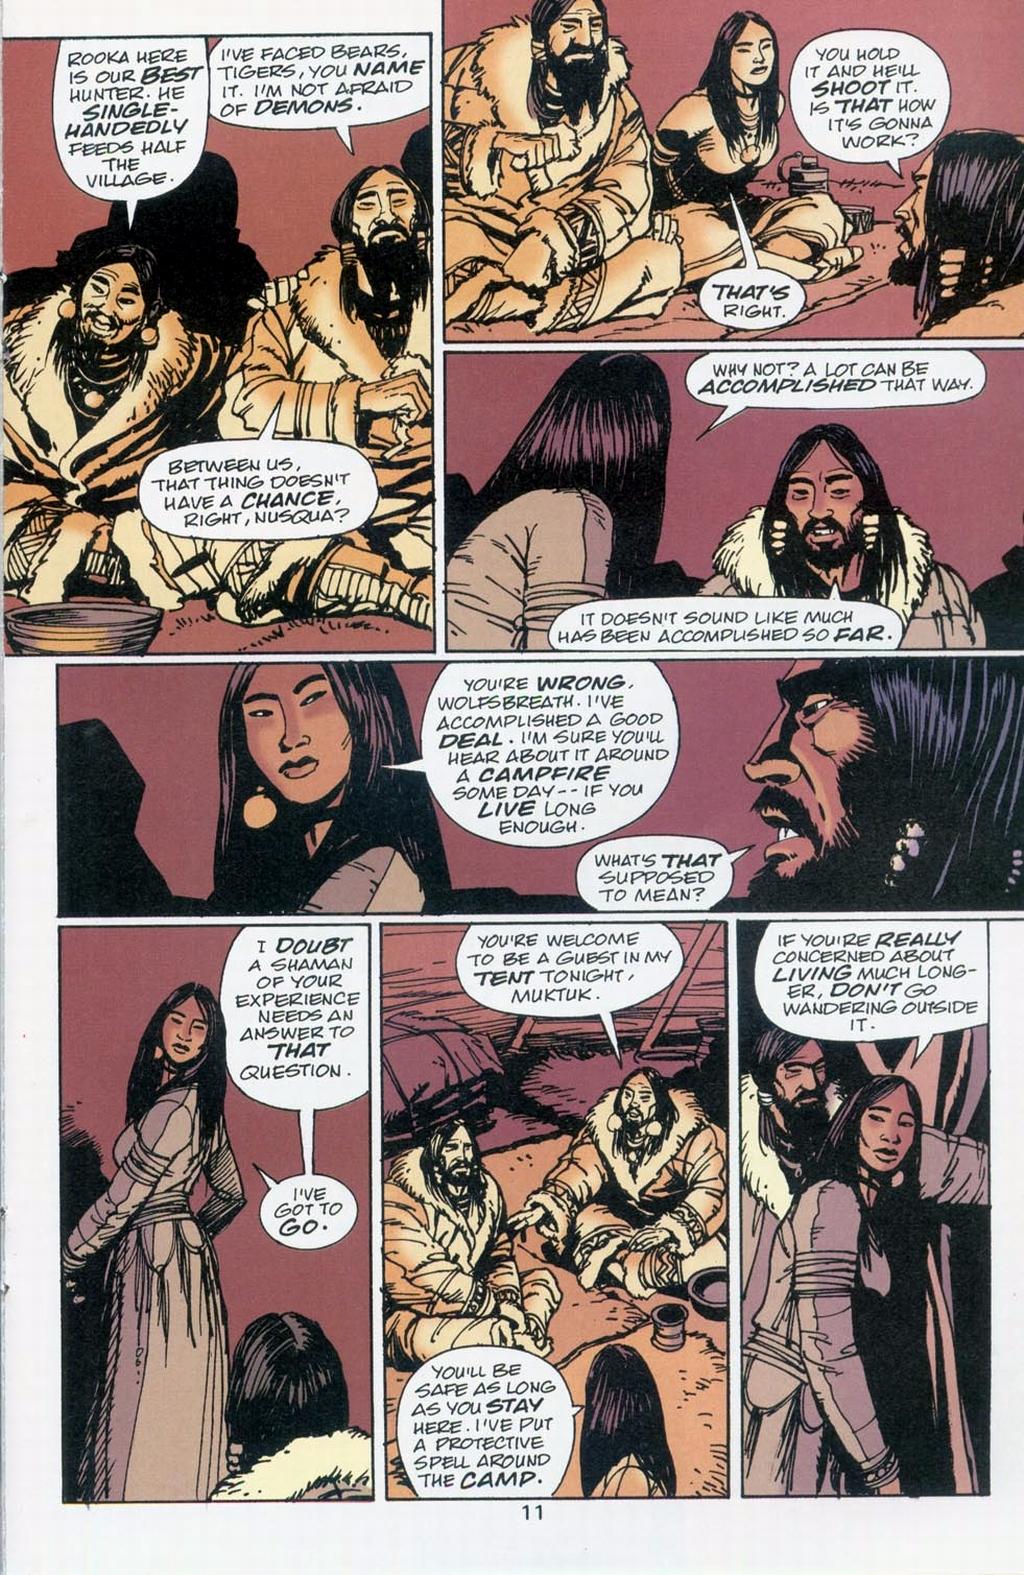 Muktuk Wolfsbreath: Hard-Boiled Shaman issue 1 - Page 11